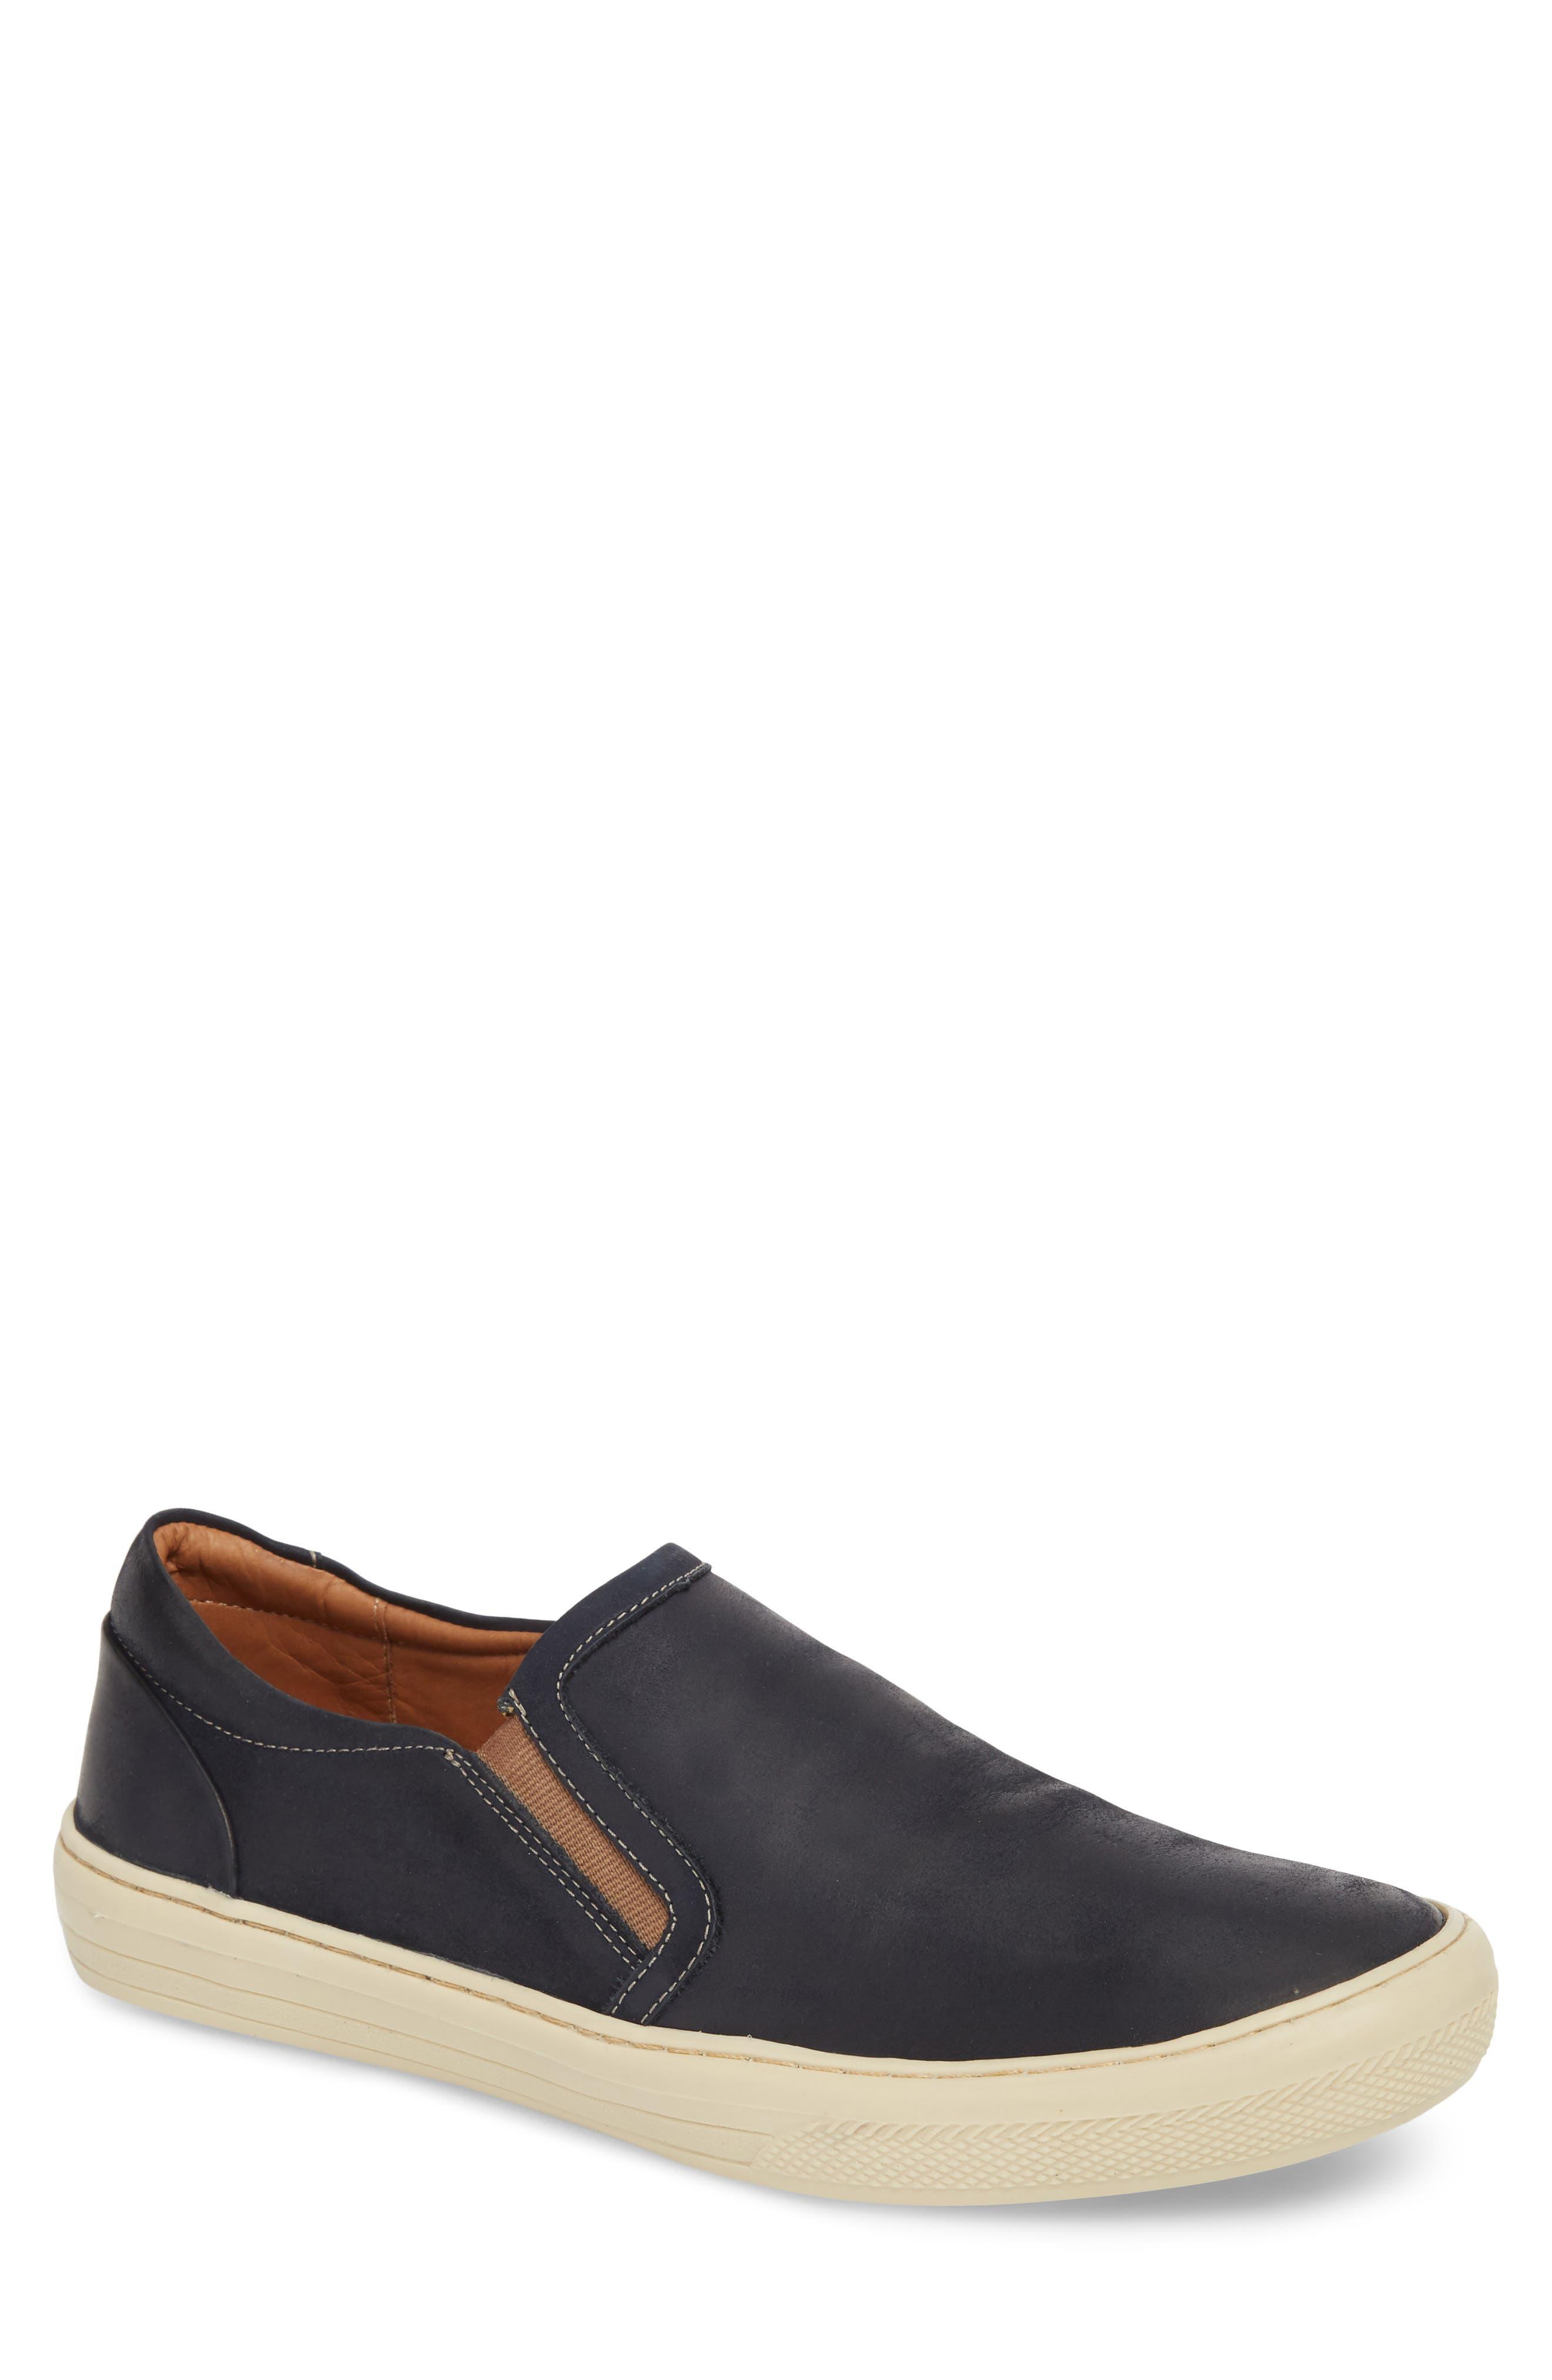 Alternate Image 1 Selected - ANATOMIC & CO. Itabuna Slip-On Sneaker (Men)